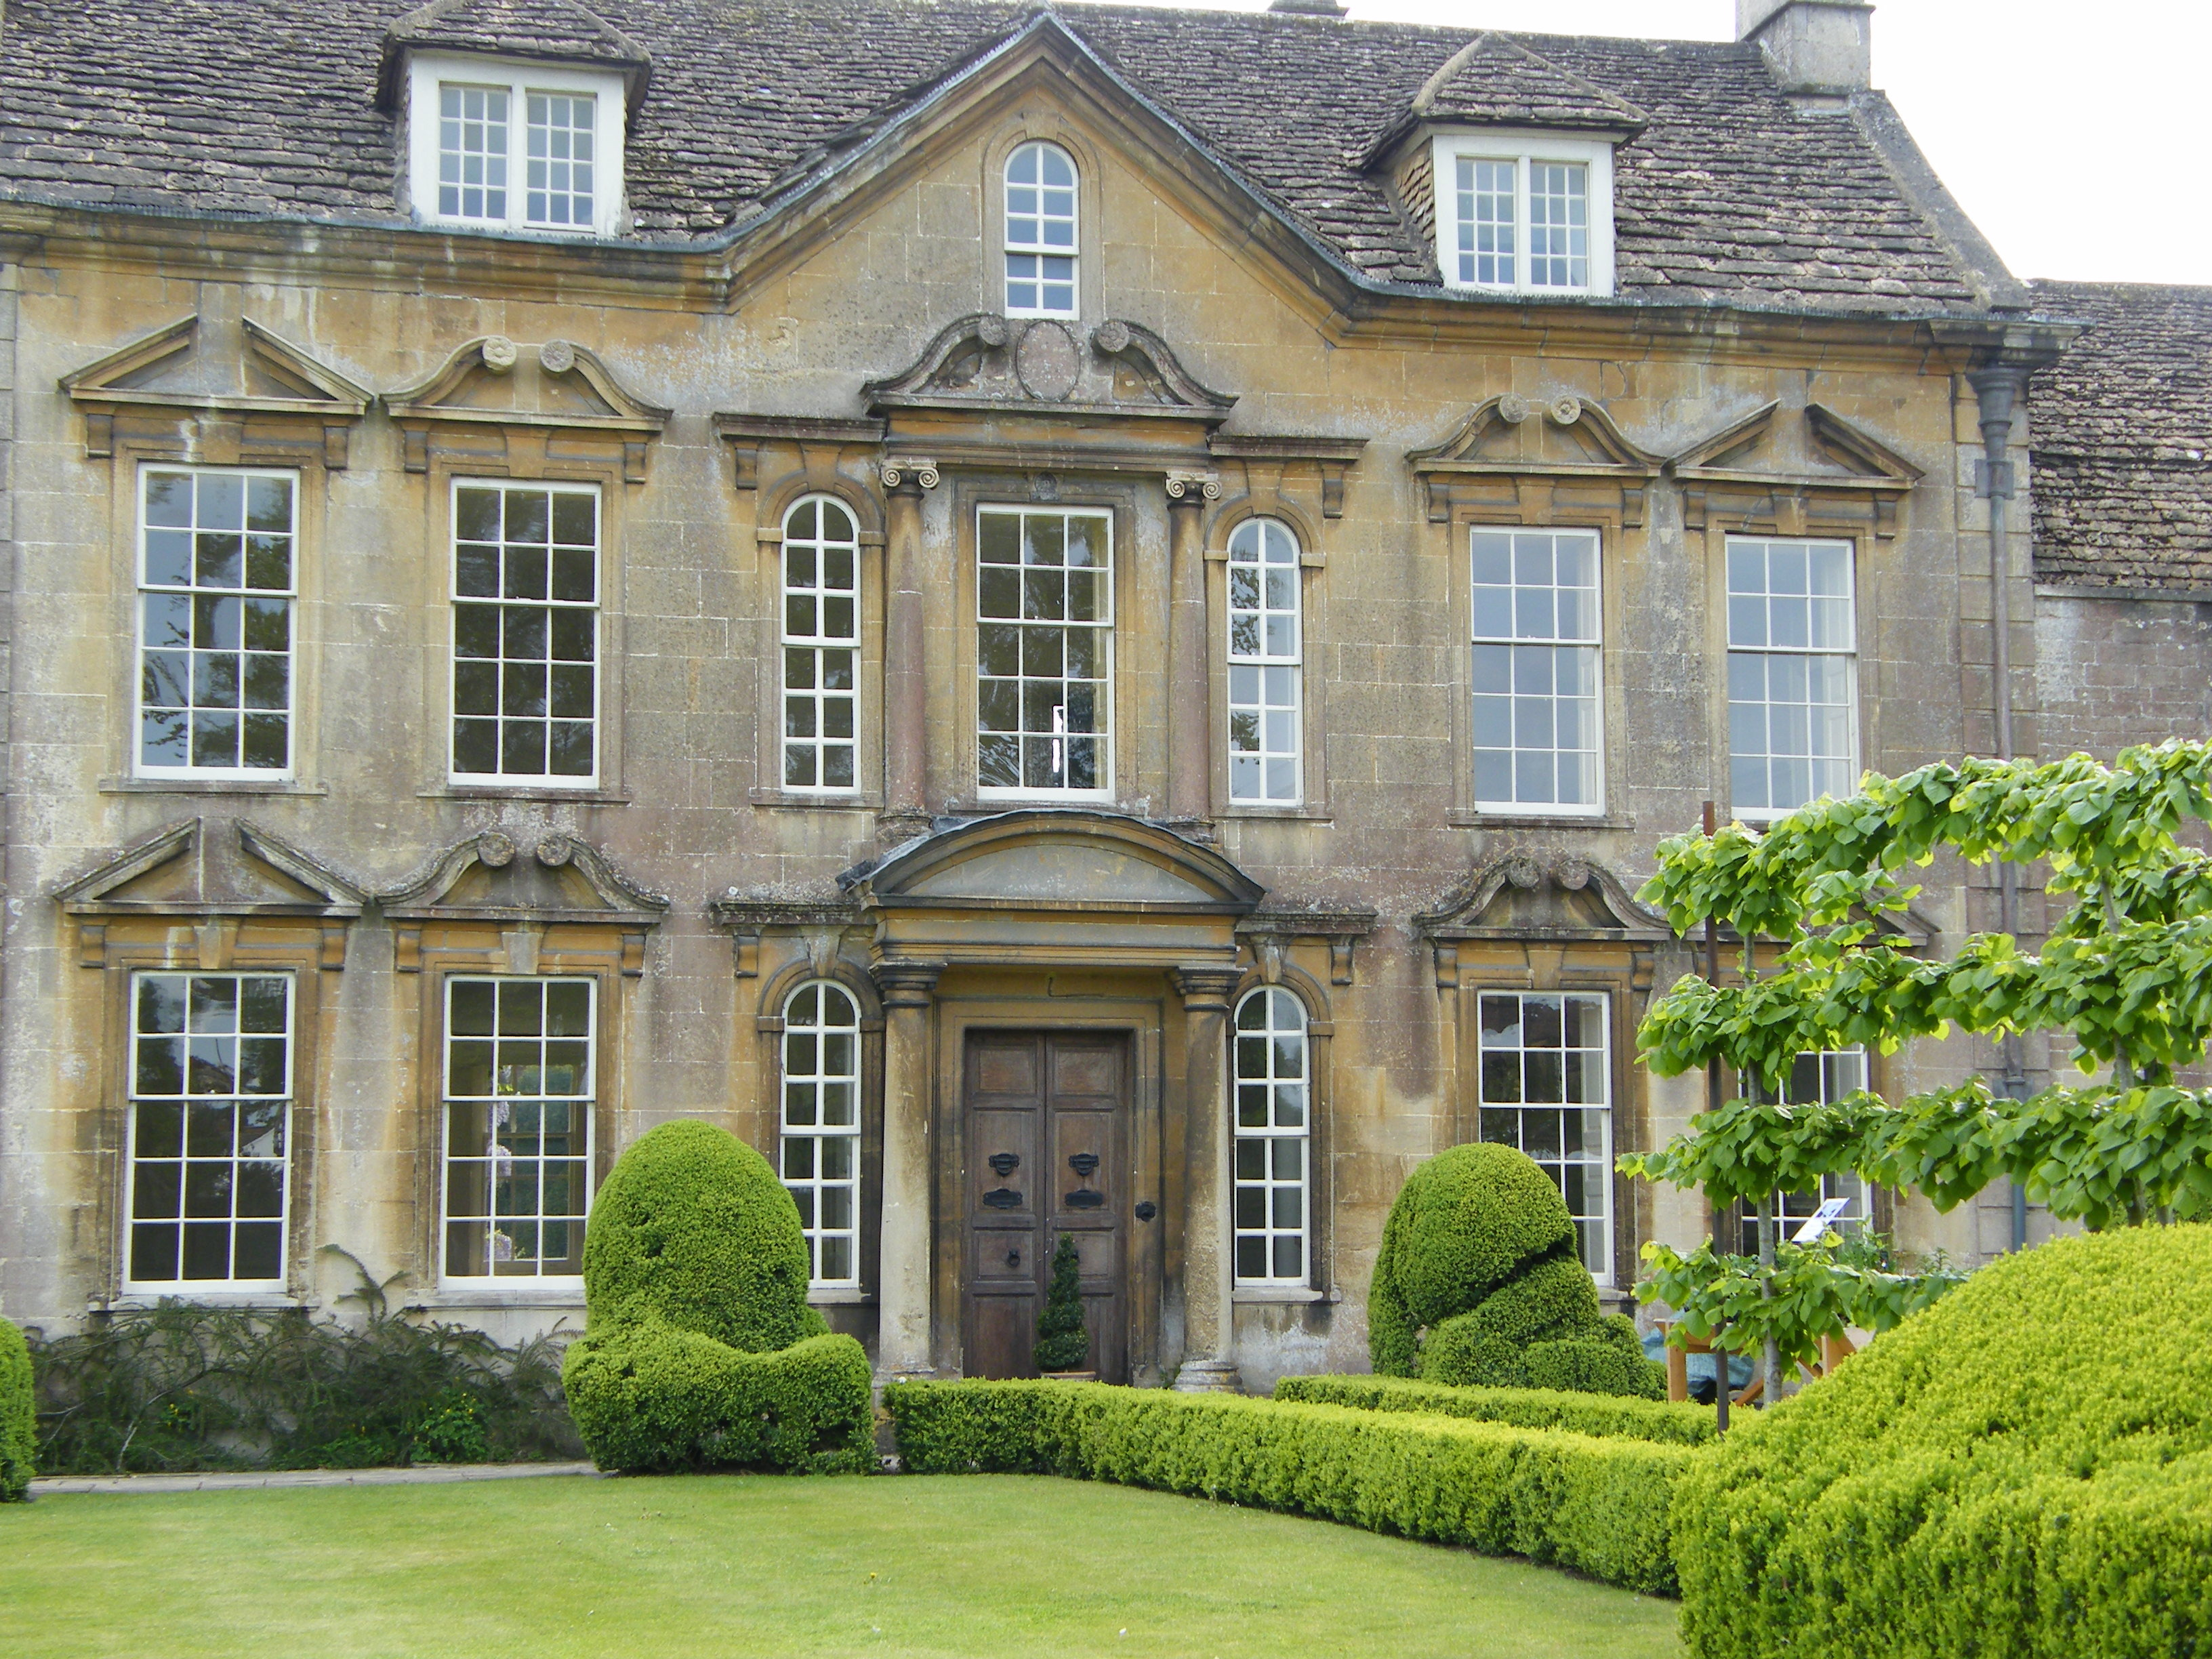 The courts viaje a visitar jardines ingleses - Inglaterra en casa ...